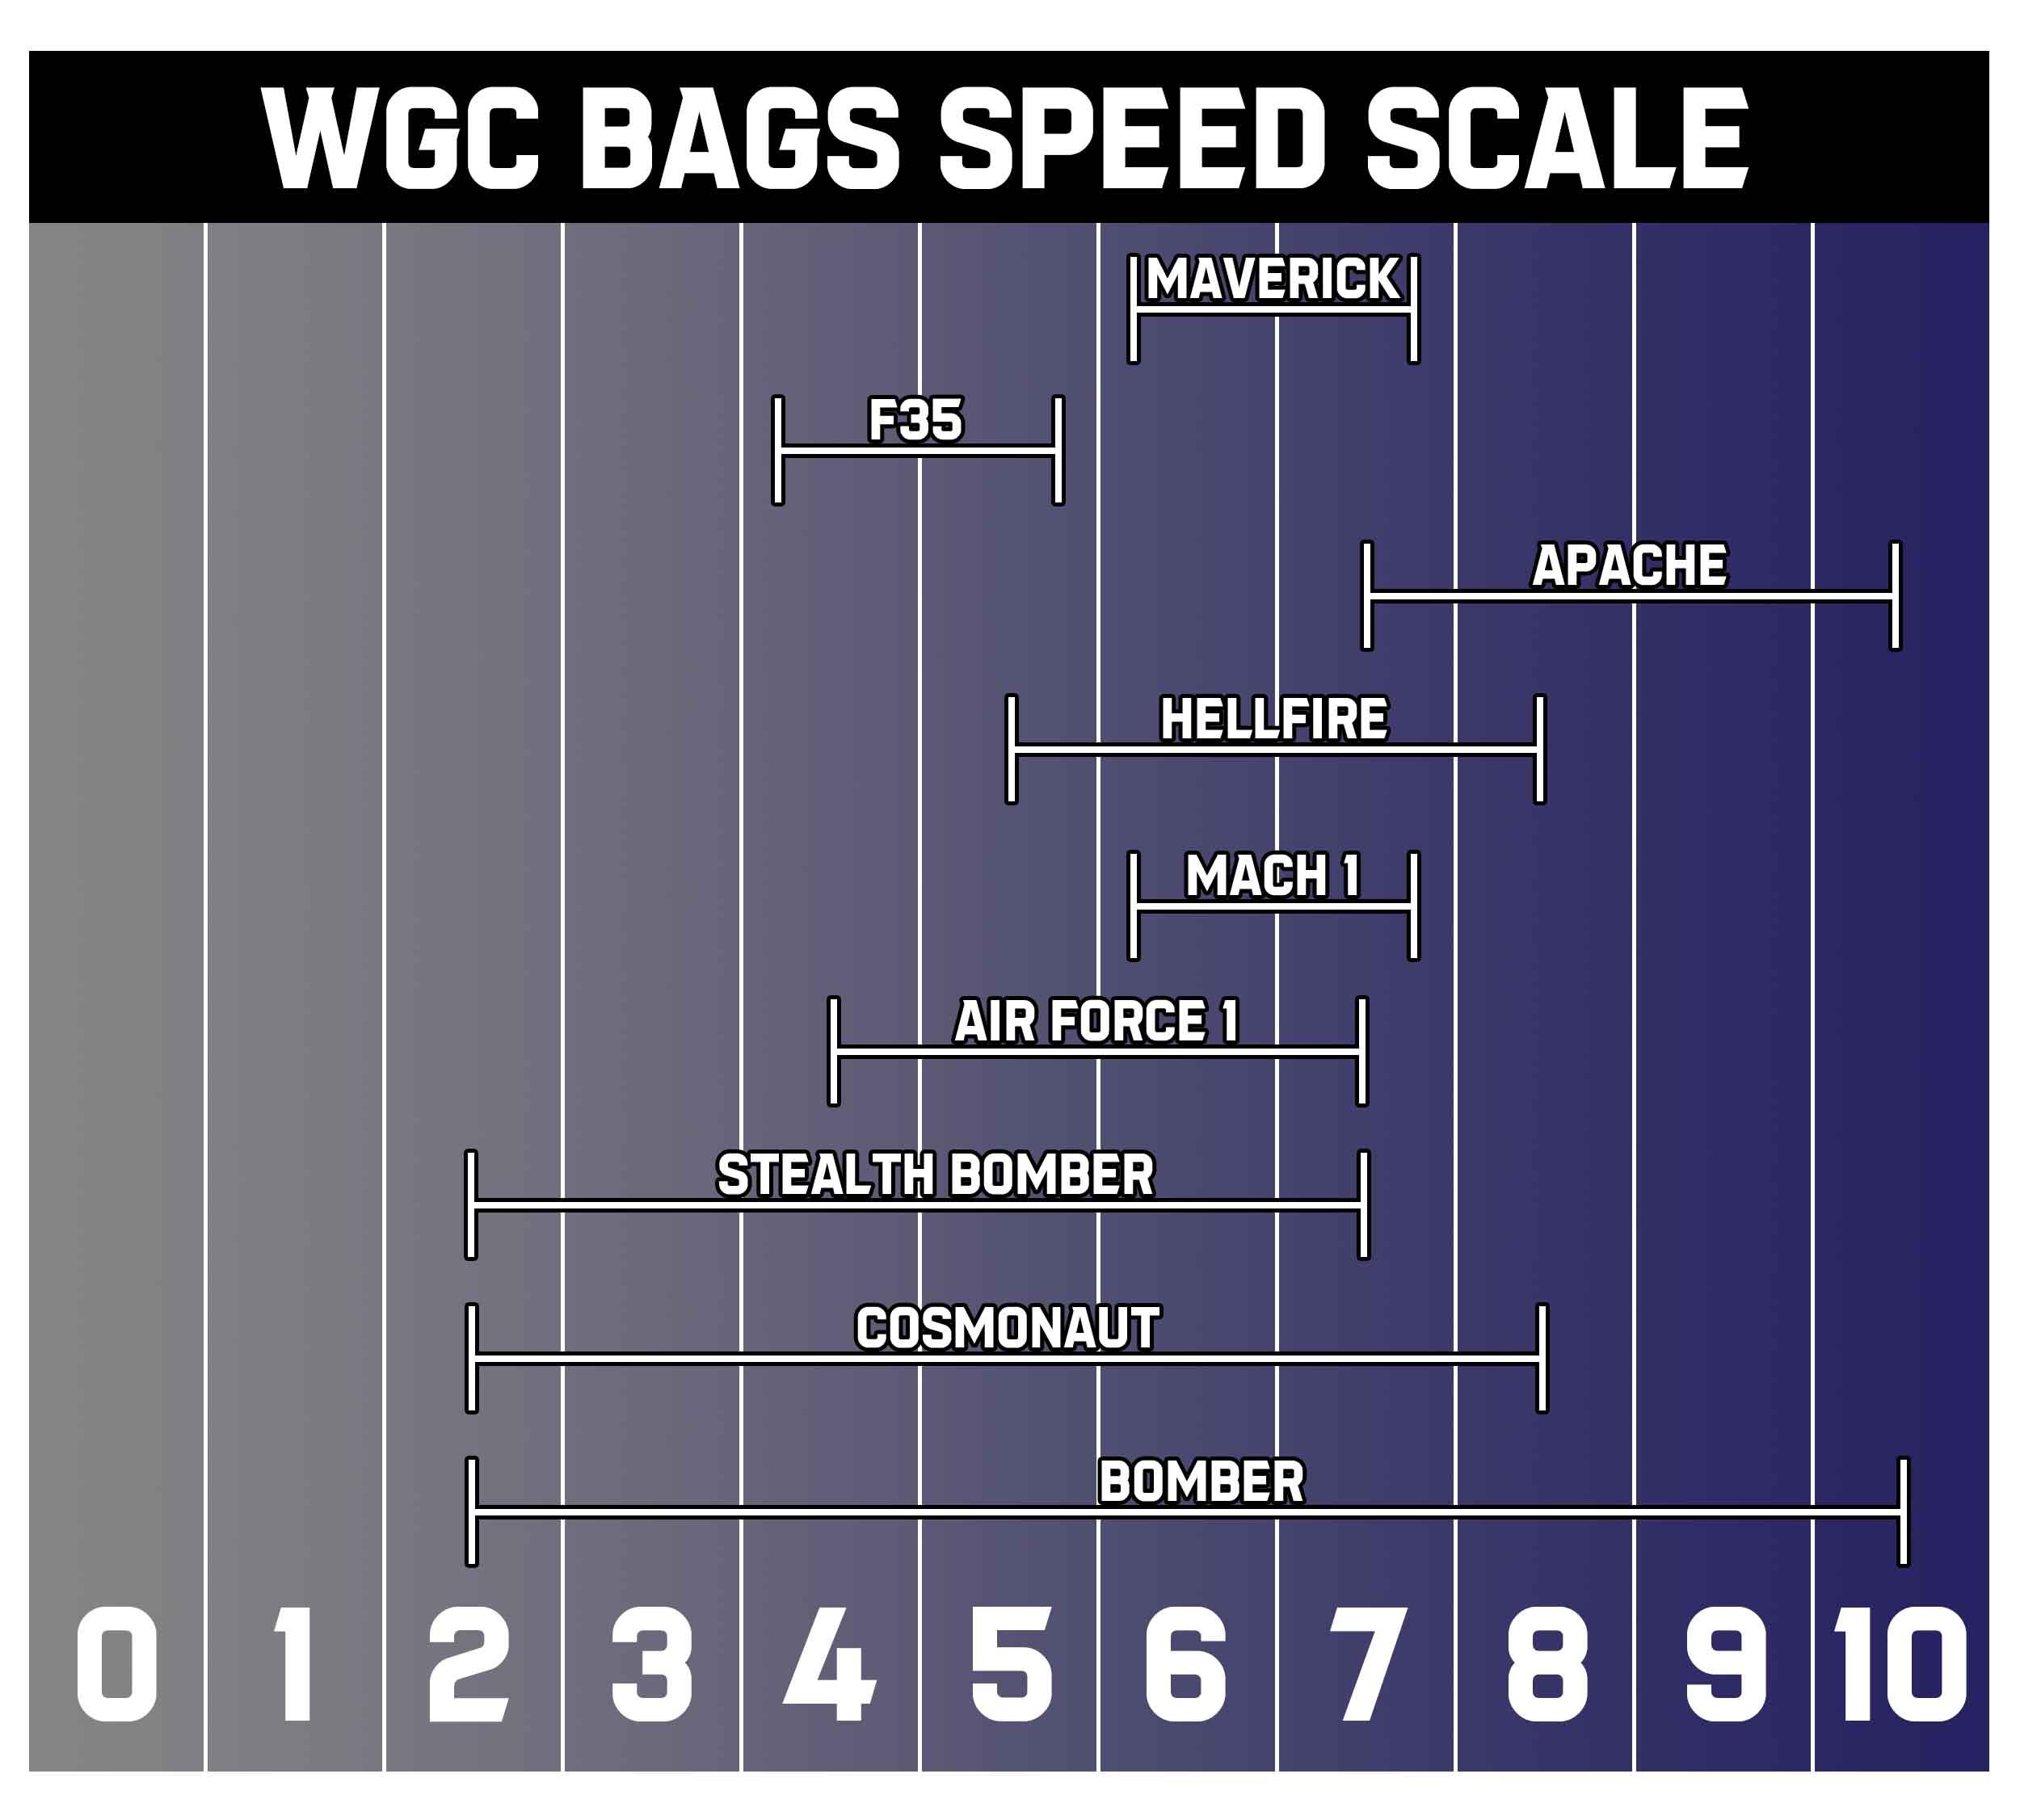 2021-wgc-speed-scale.jpg